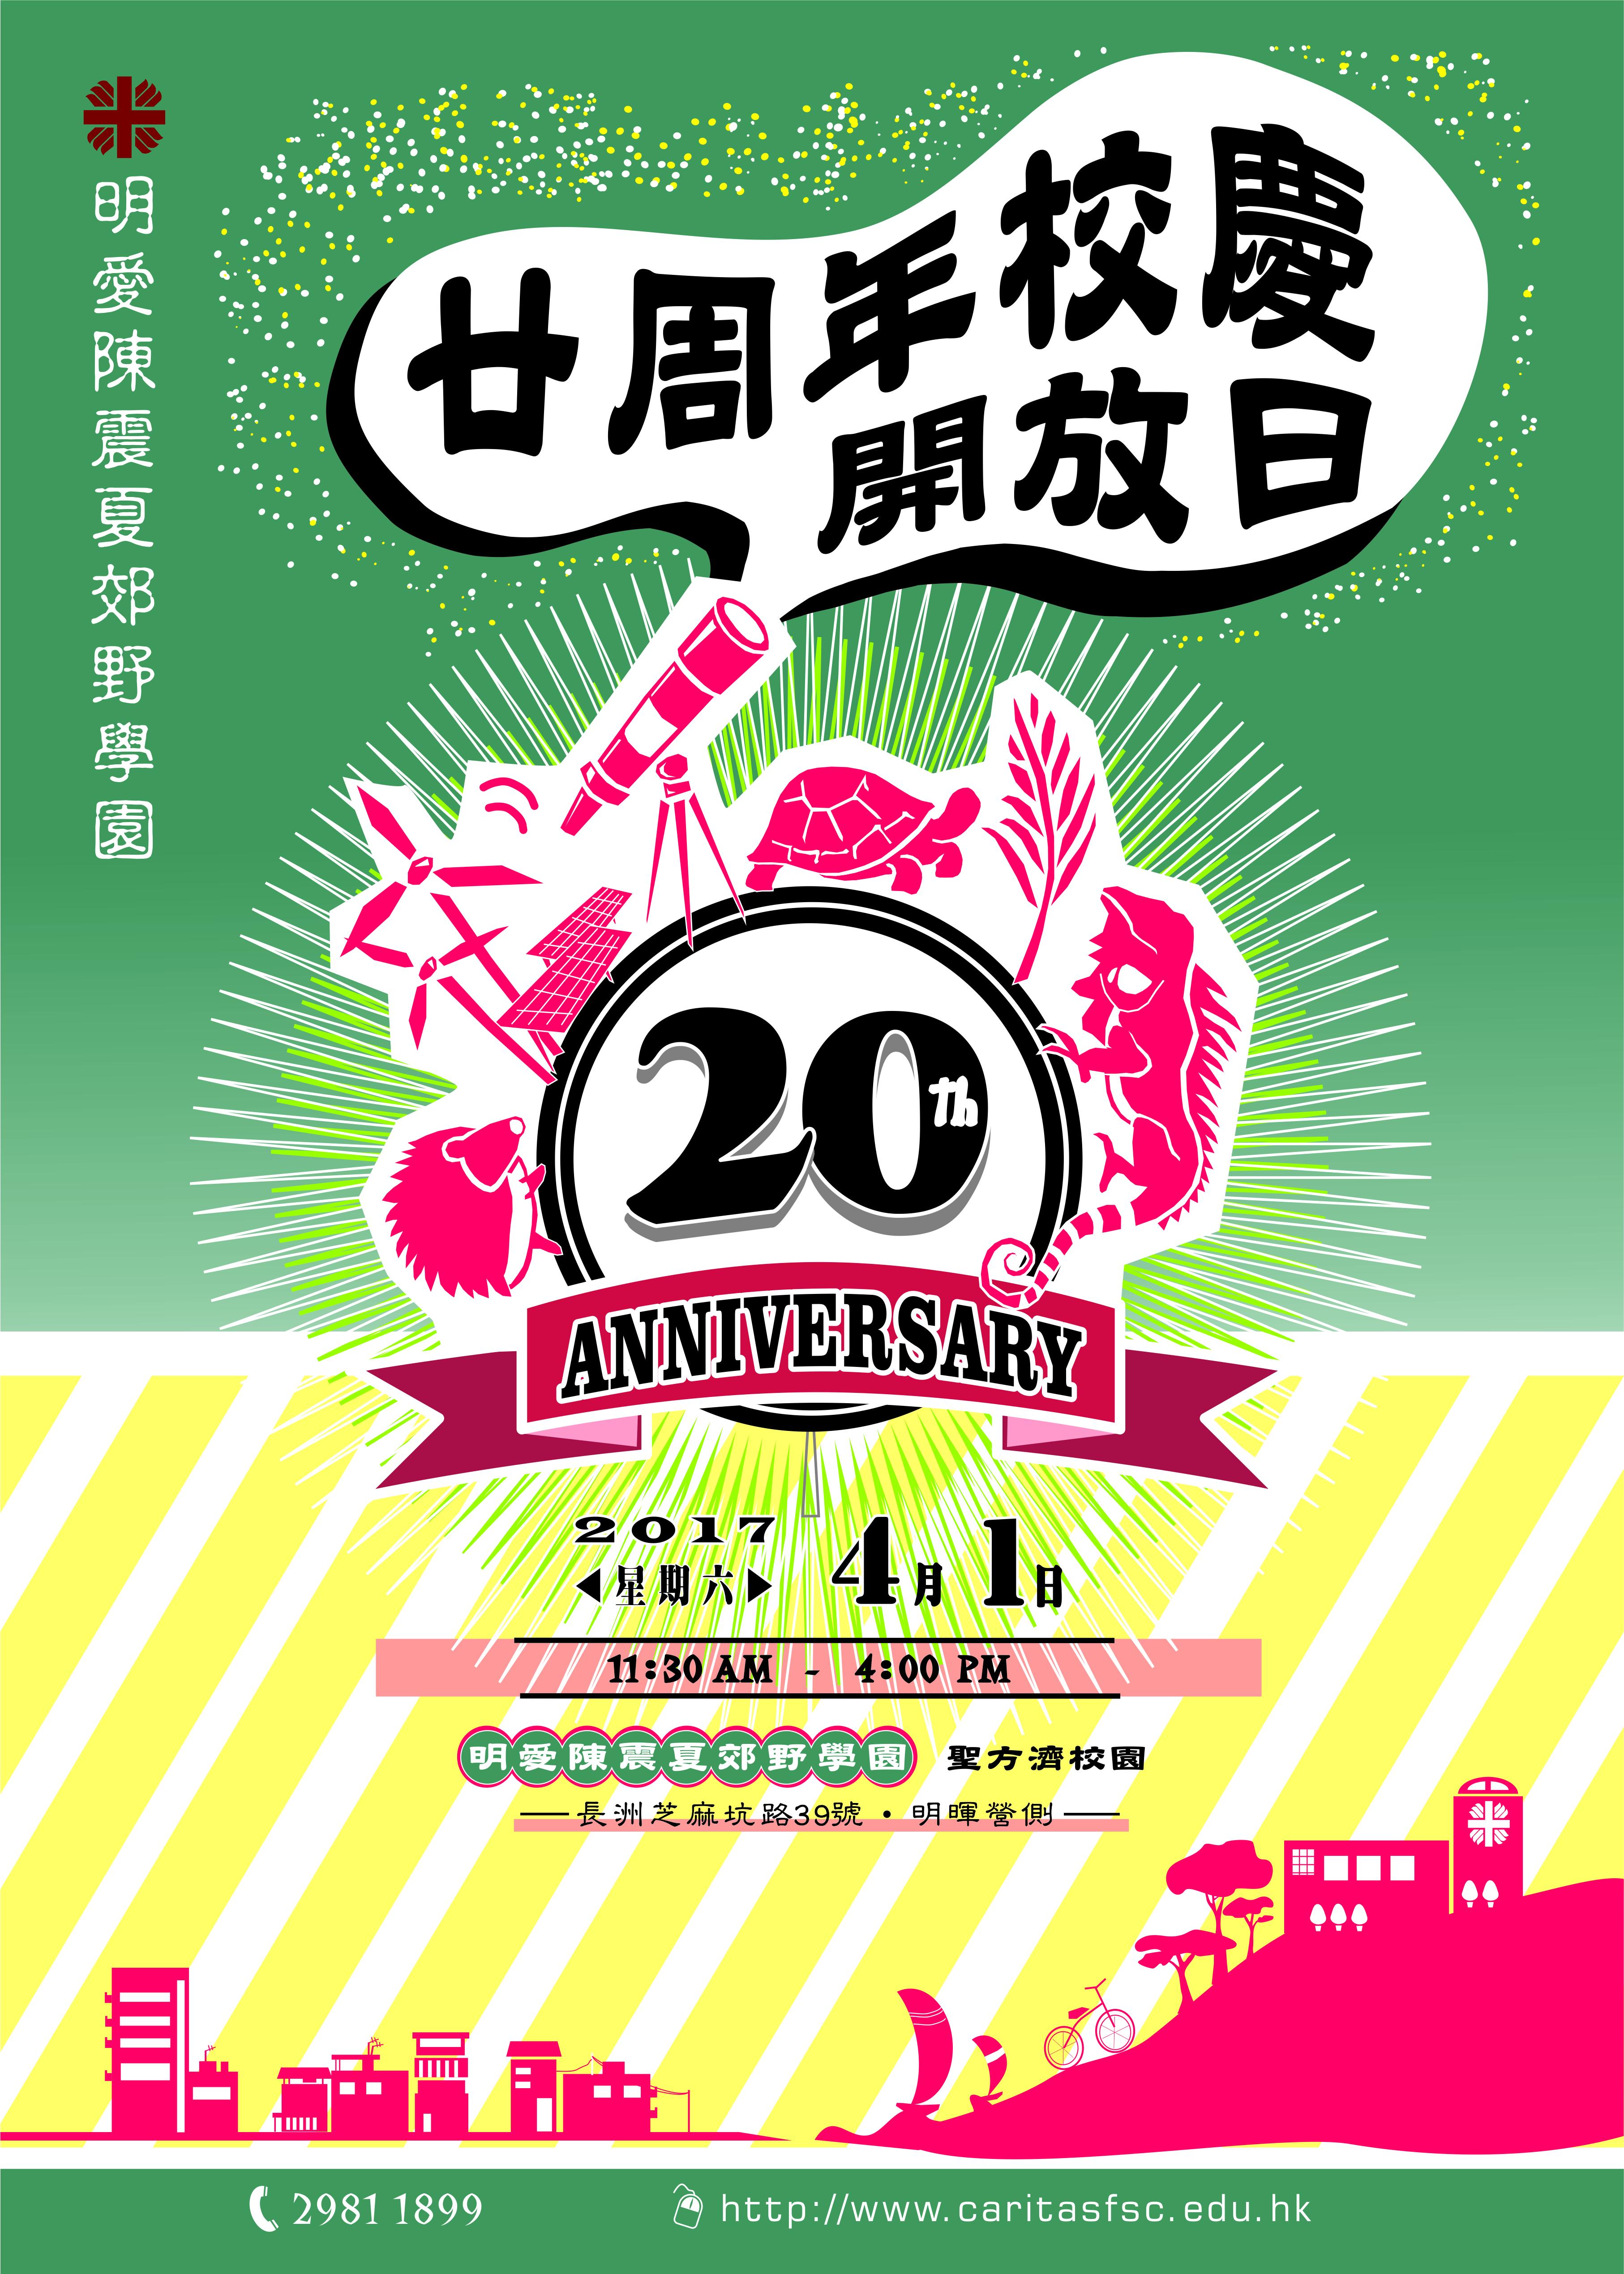 20th poster(A3_每邊5mm出血位)